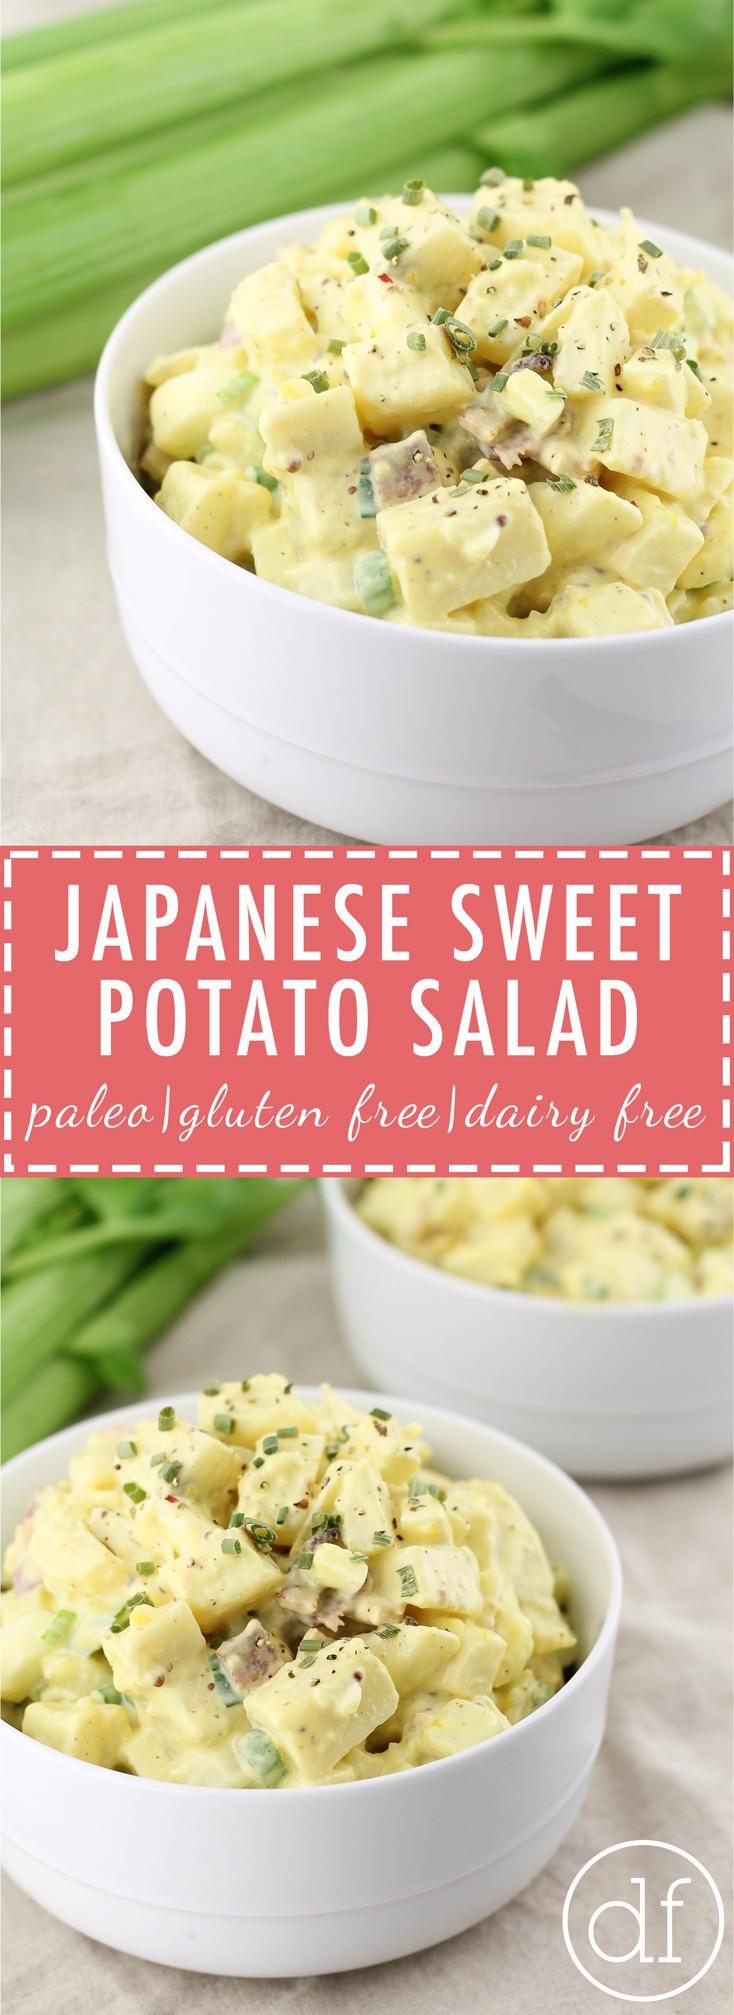 Japanese Sweet Potato Salad, Paleo, Grain Free, Gluten Free, Dairy Free, Healthy Potato Salad, Summer Recipes, Real Food, BBQ Recipes, Summer Salads, Primal, Whole30, No Sugar, Real Food